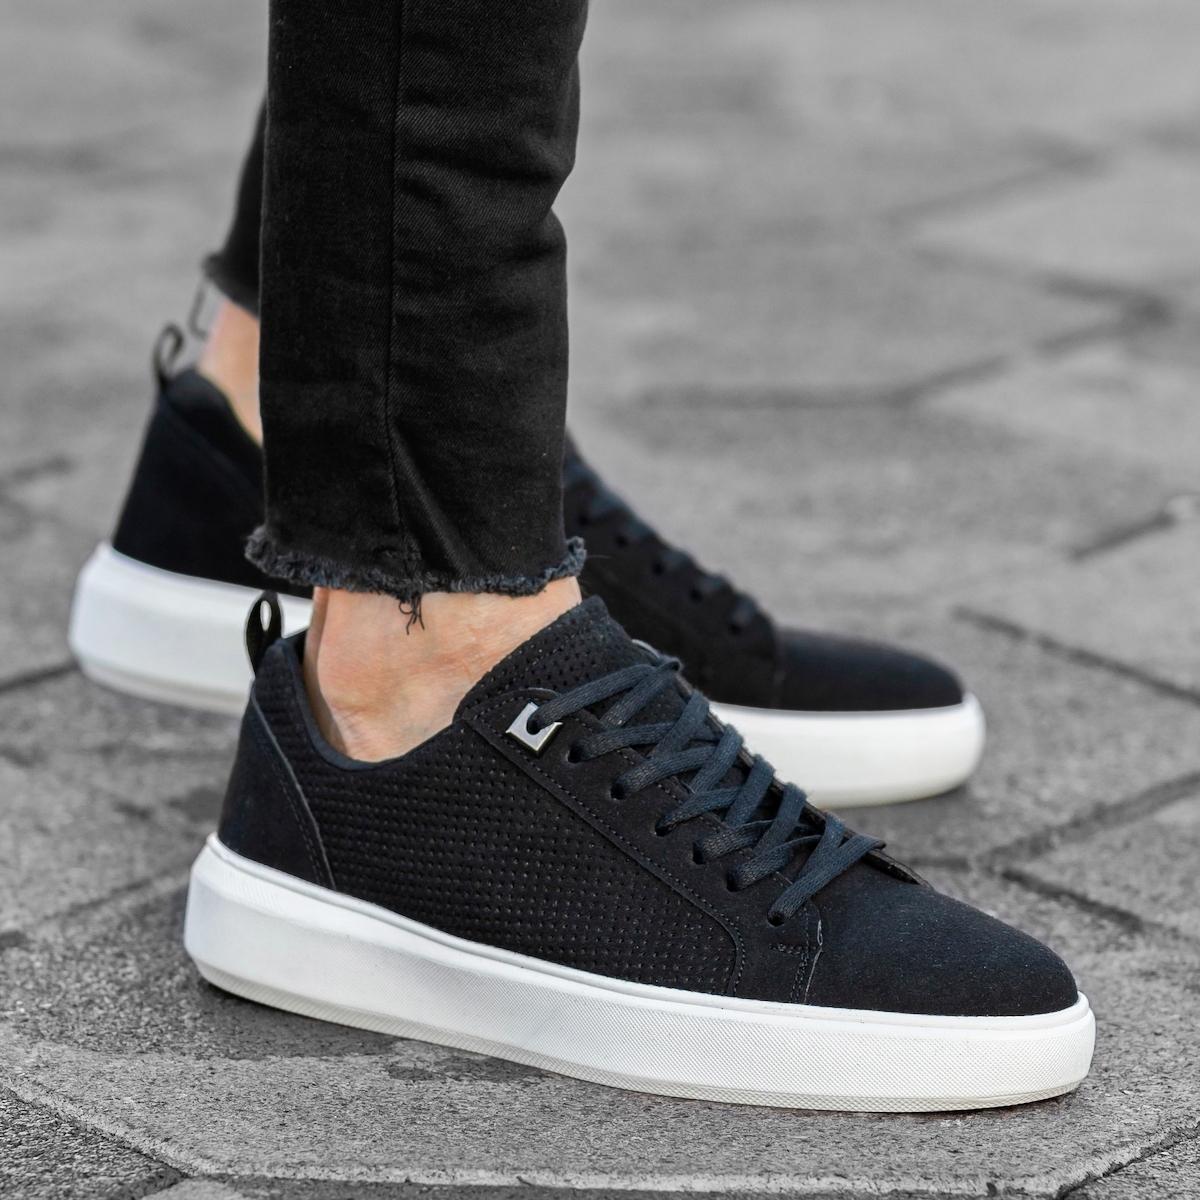 Men's Flat Sole Suede Sneakers In Black